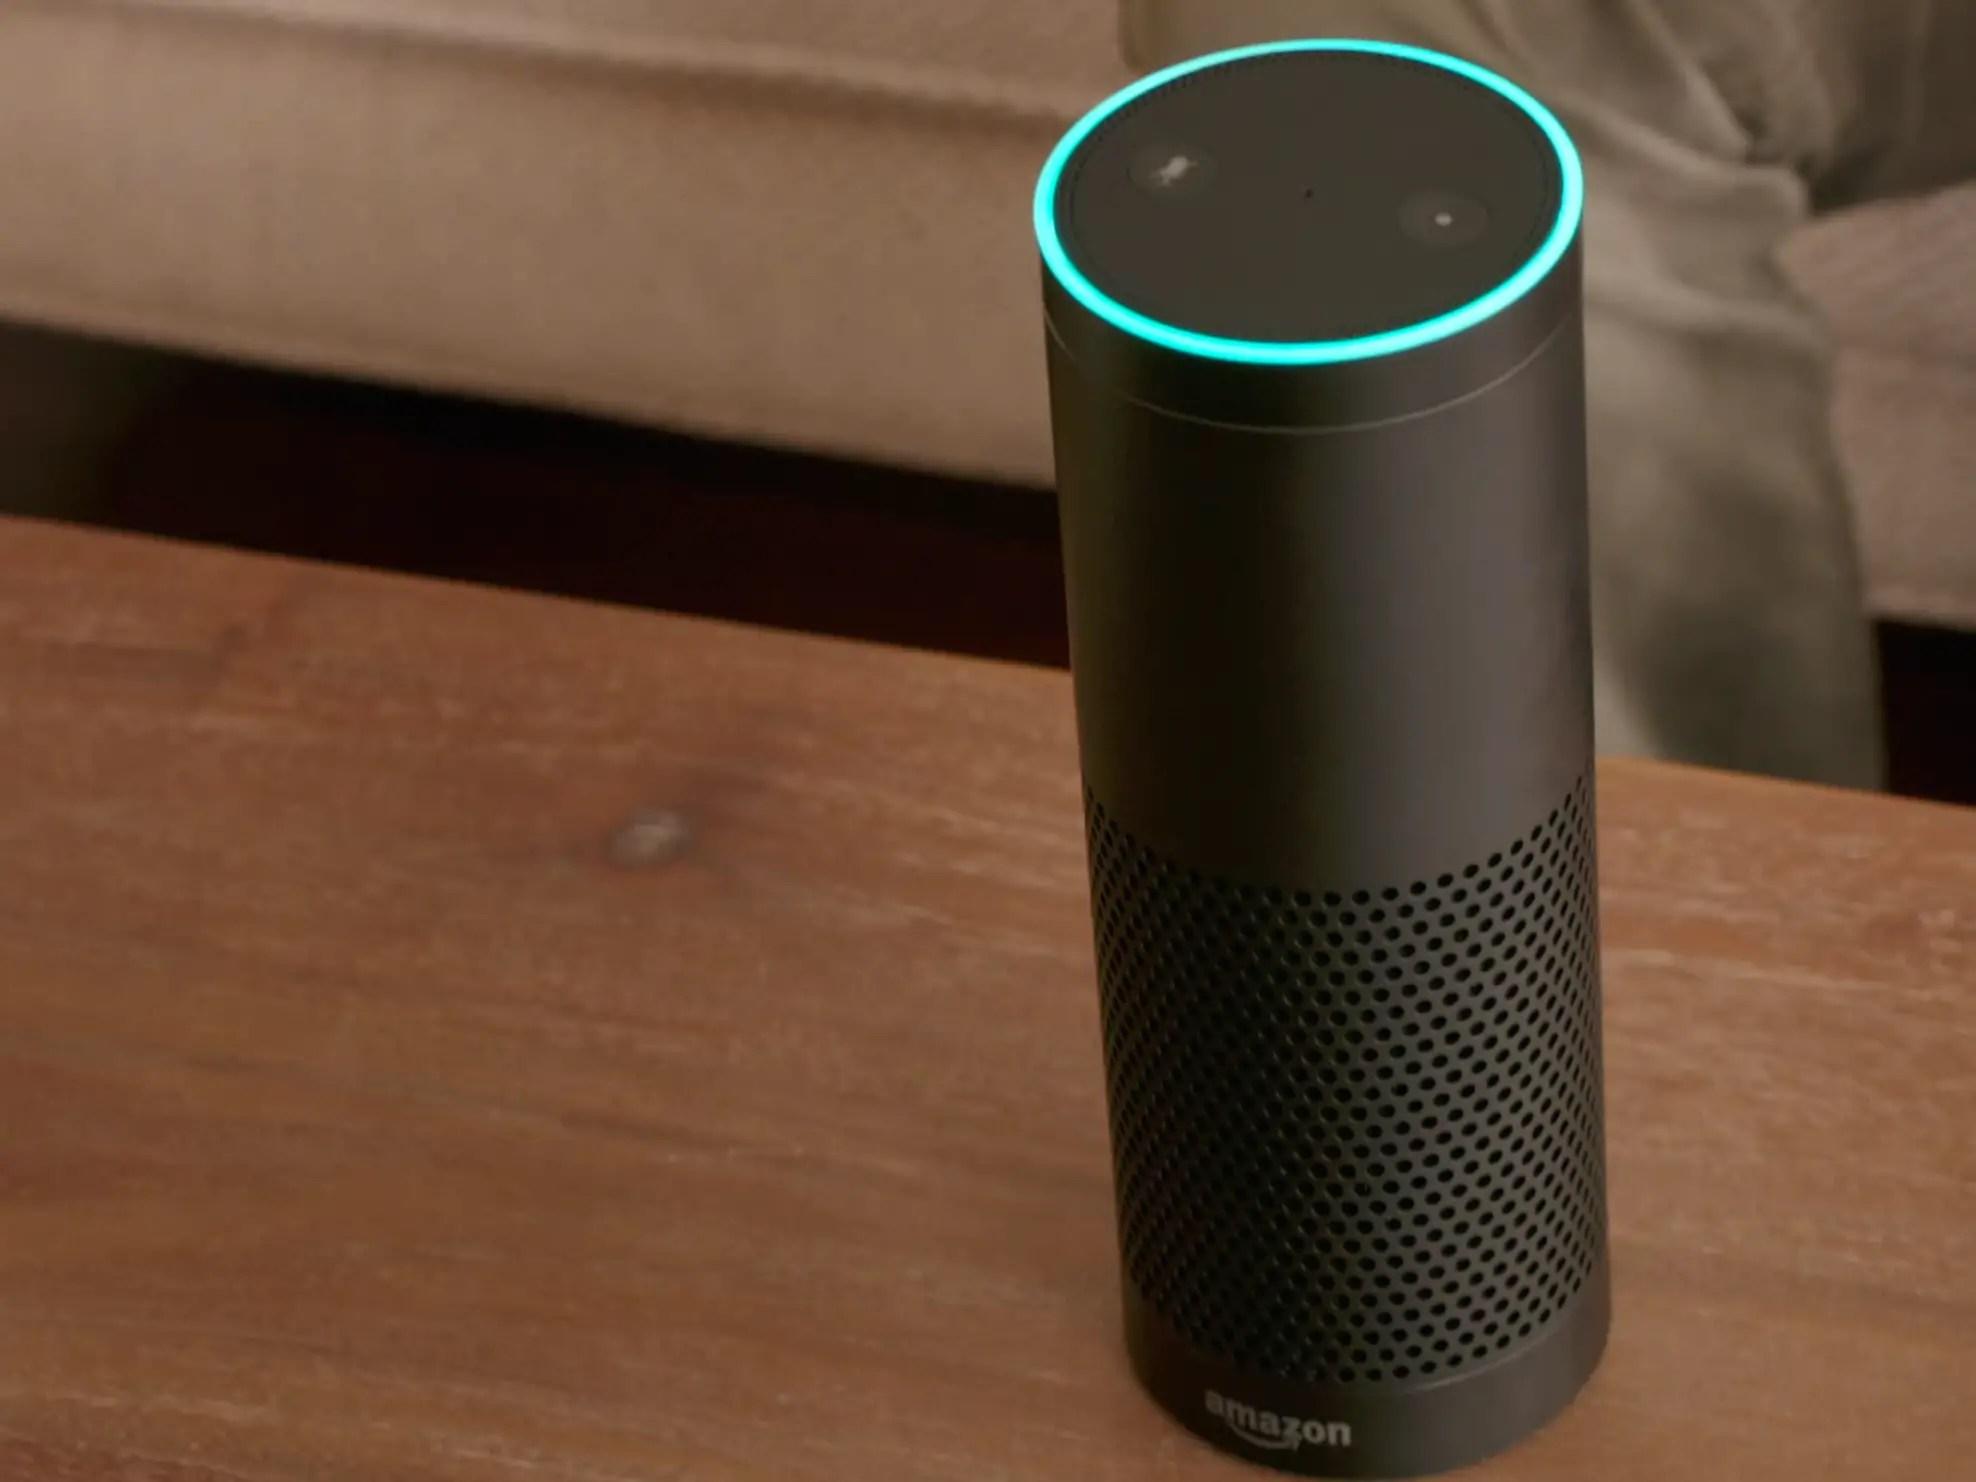 Alexa Web and App Updates